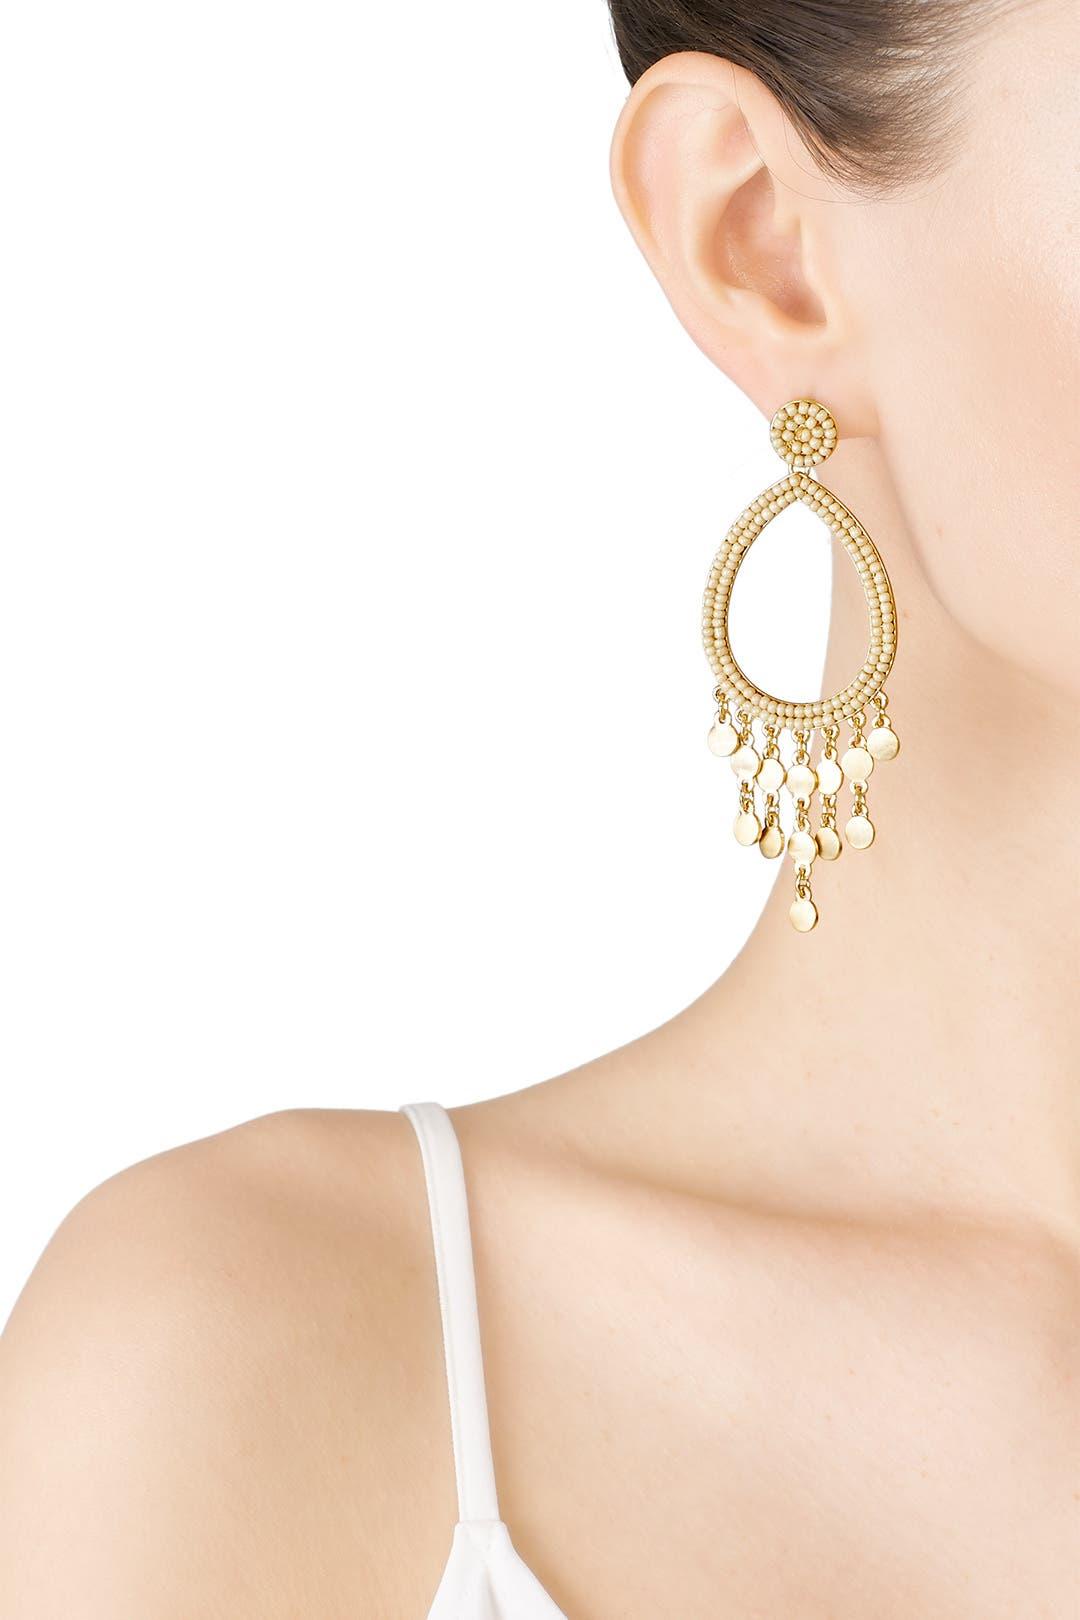 e7621ade3d0bb Rebecca Minkoff Accessories Riley Beaded Drop Earrings